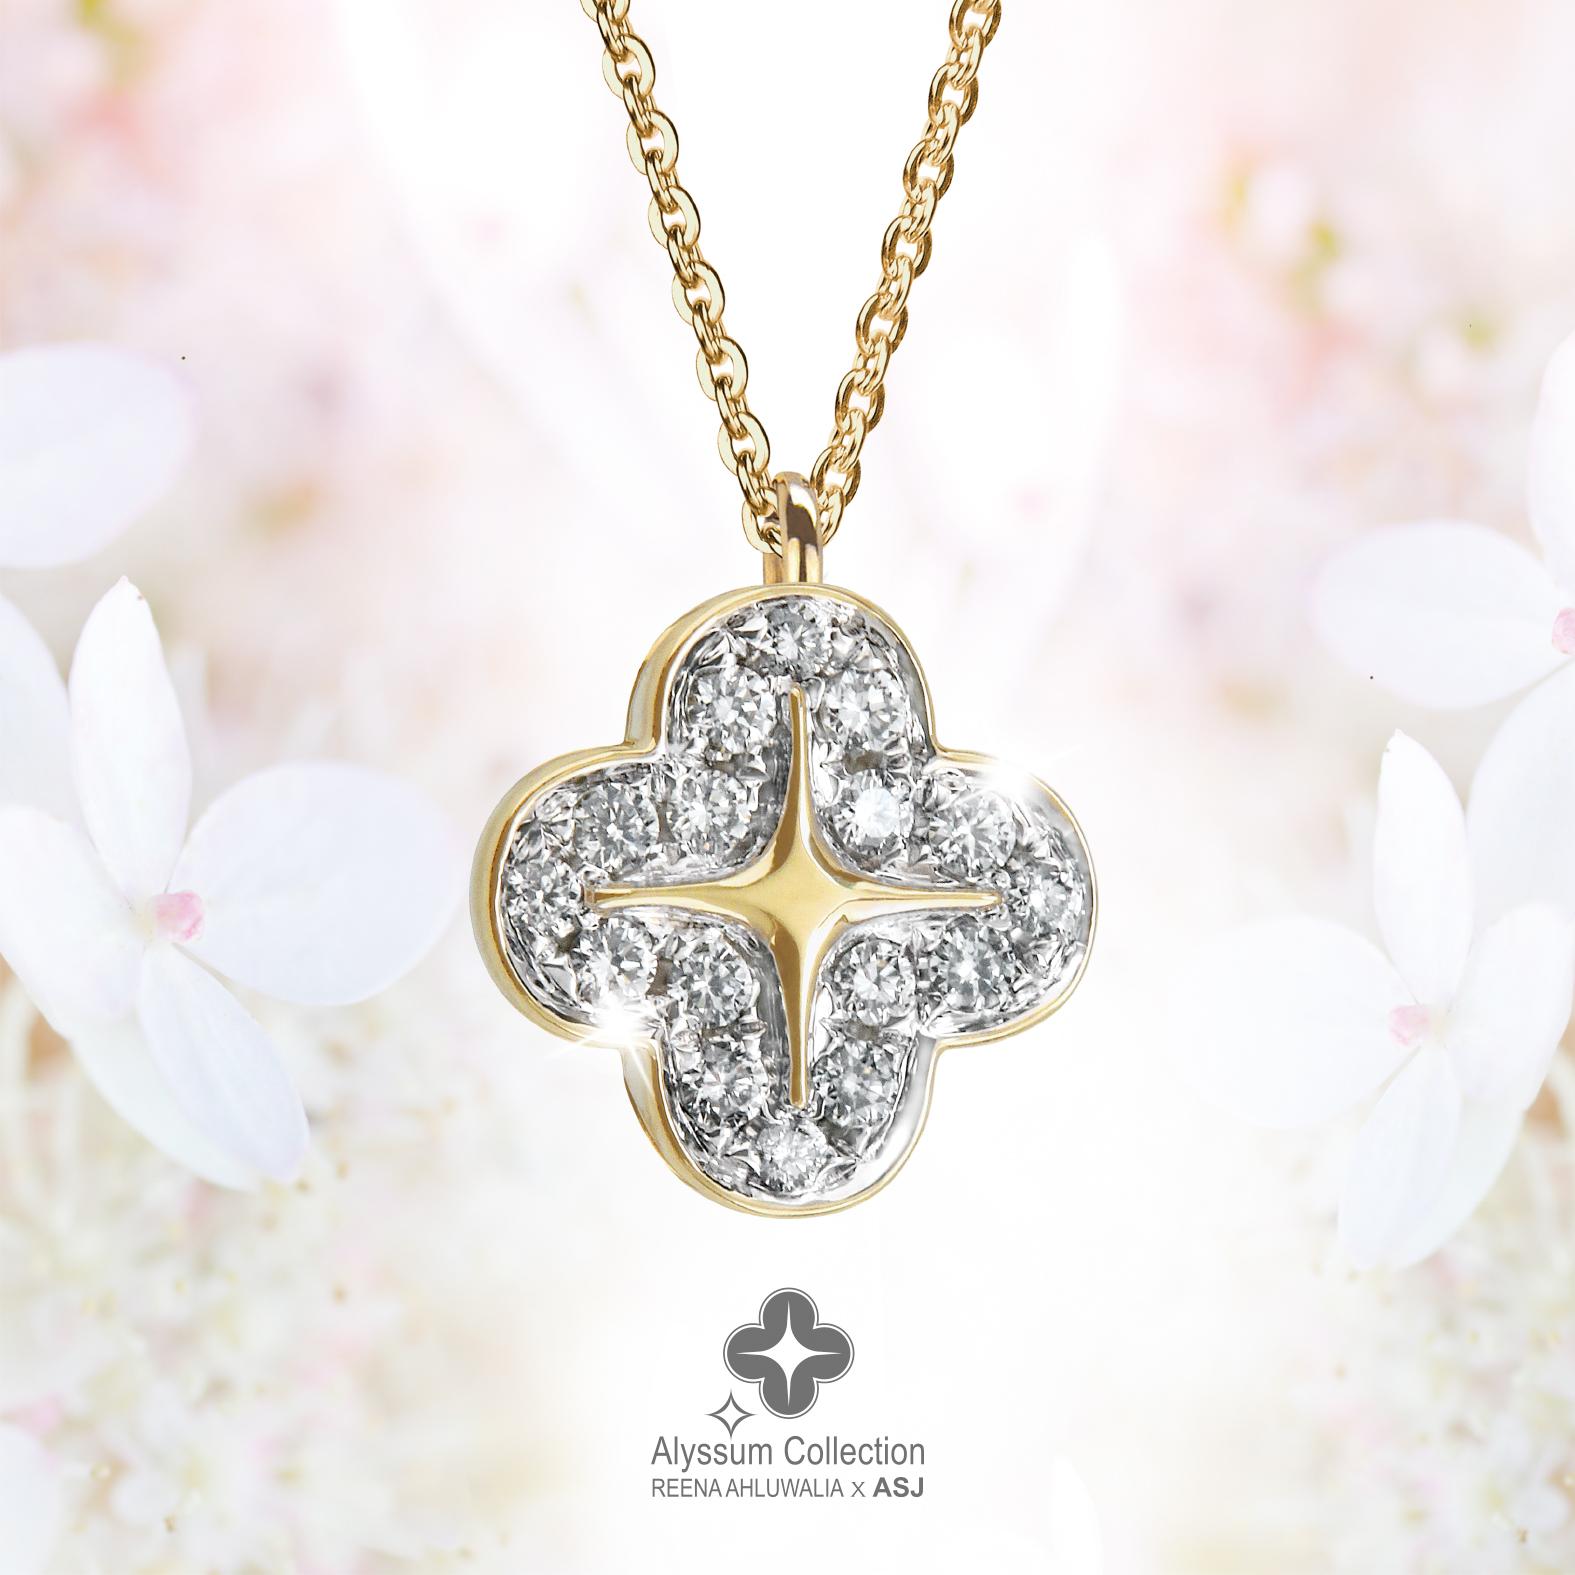 6_Alyssum Collection  By Reena Ahluwalia_Gold_Diamonds.jpg